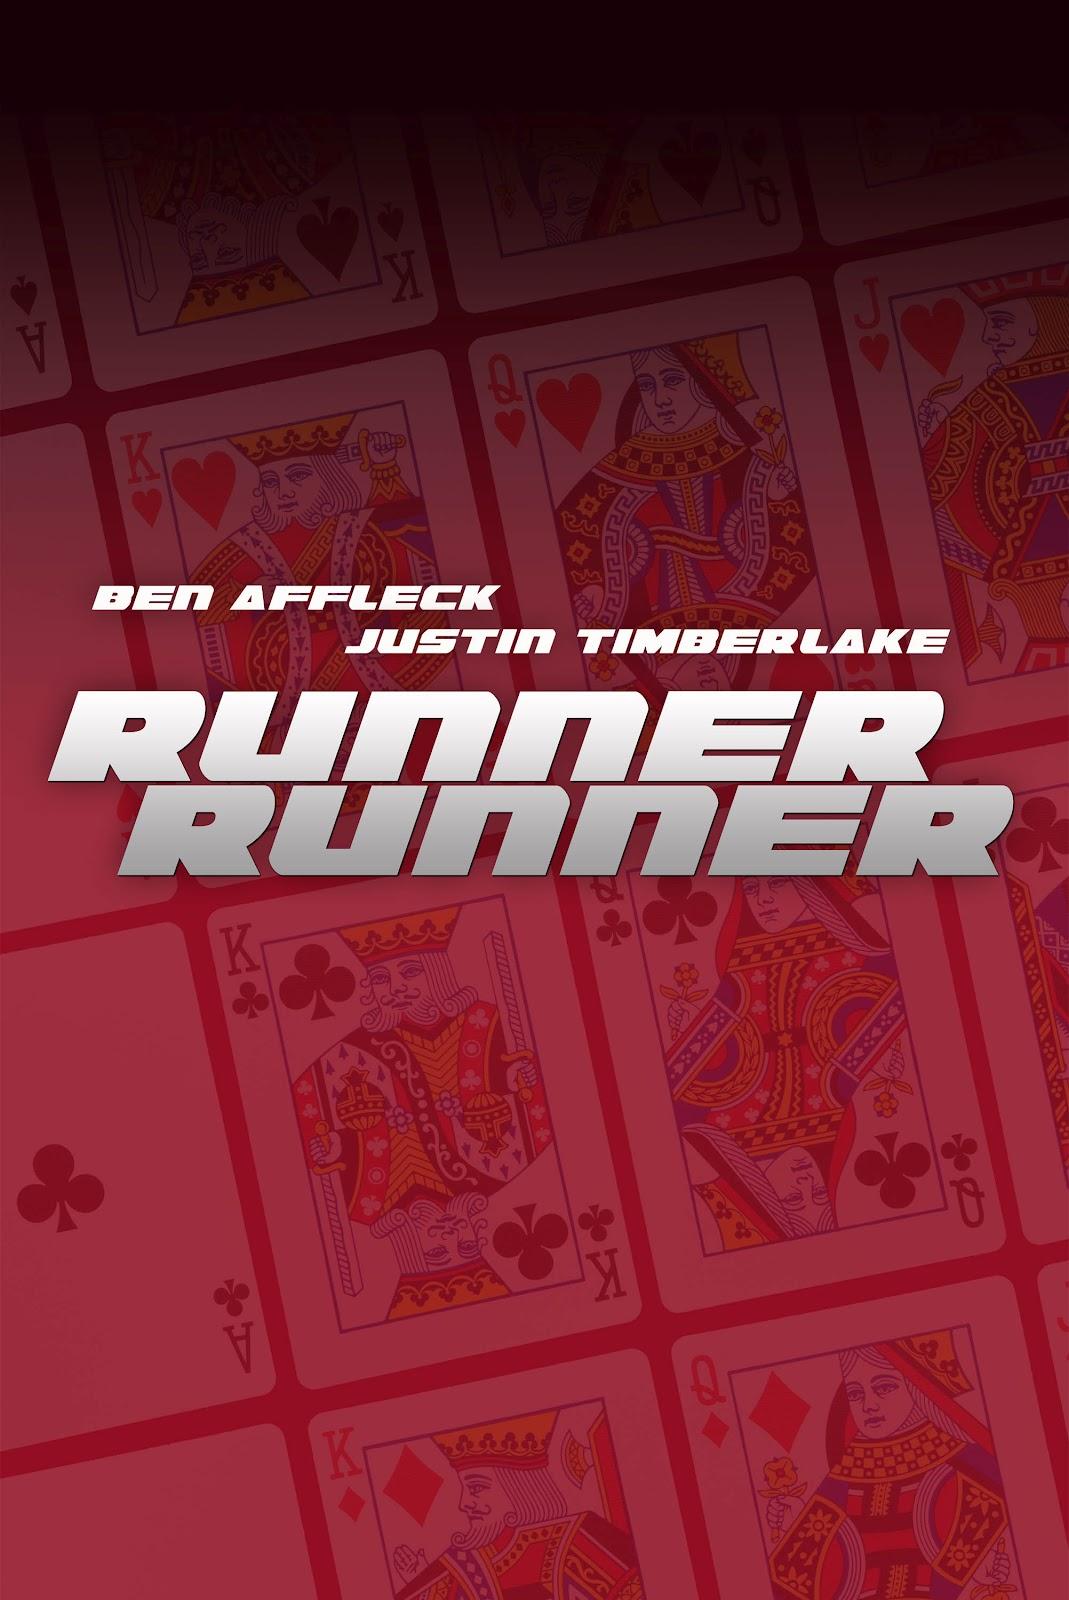 http://3.bp.blogspot.com/-RiXsR42EOzg/UQJ93CxOT8I/AAAAAAAAE5w/jkzWM068J_k/s1600/Runner+Runner+(2013)+Movie+Poster.jpg